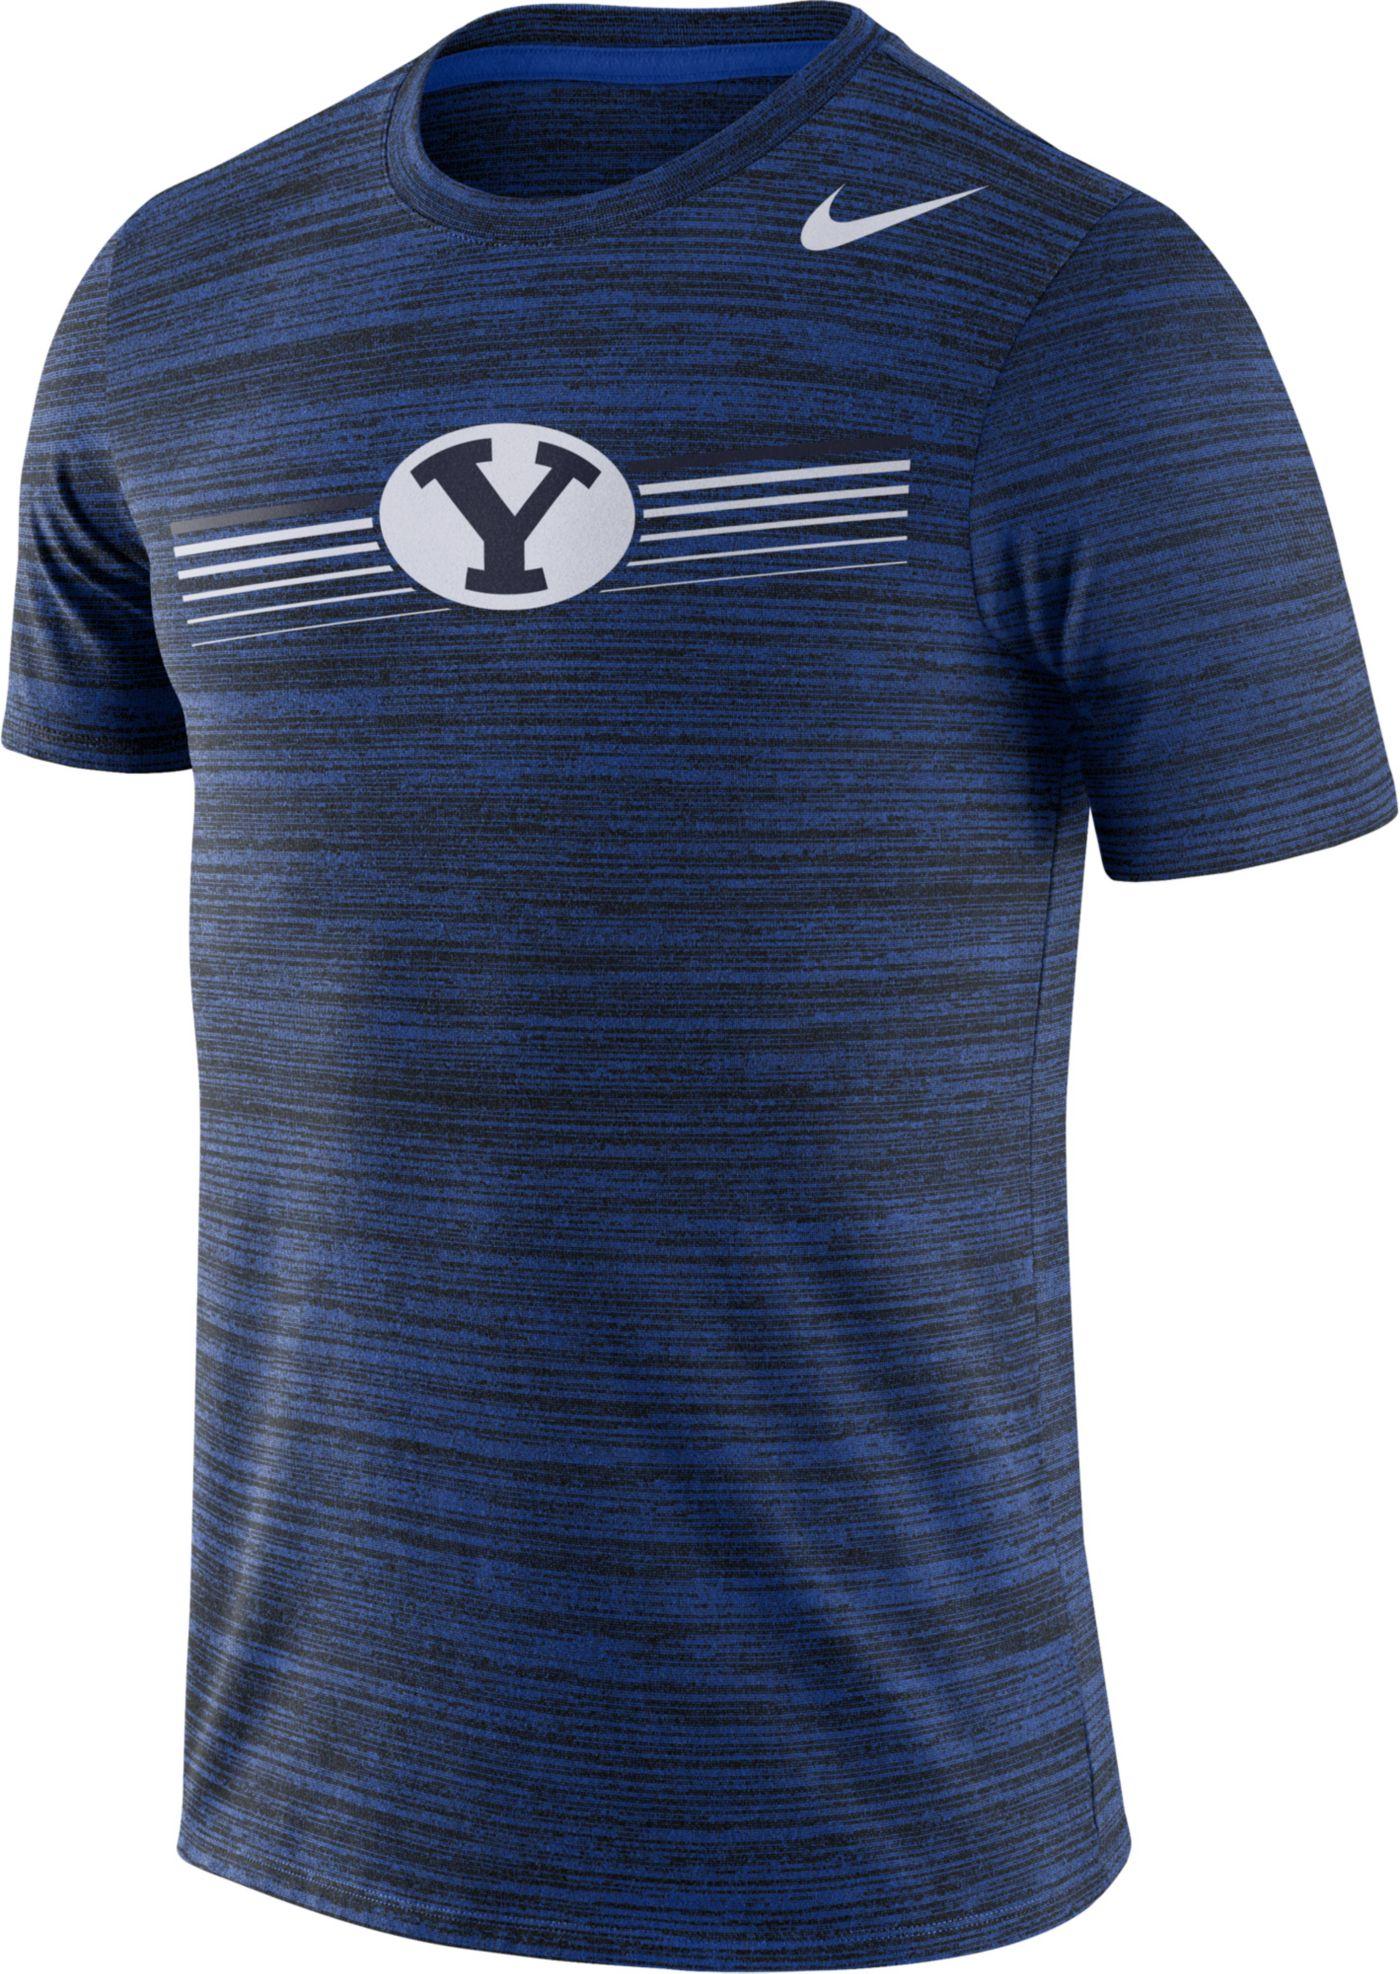 Nike Men's BYU Cougars Blue Velocity Legend Graphic T-Shirt